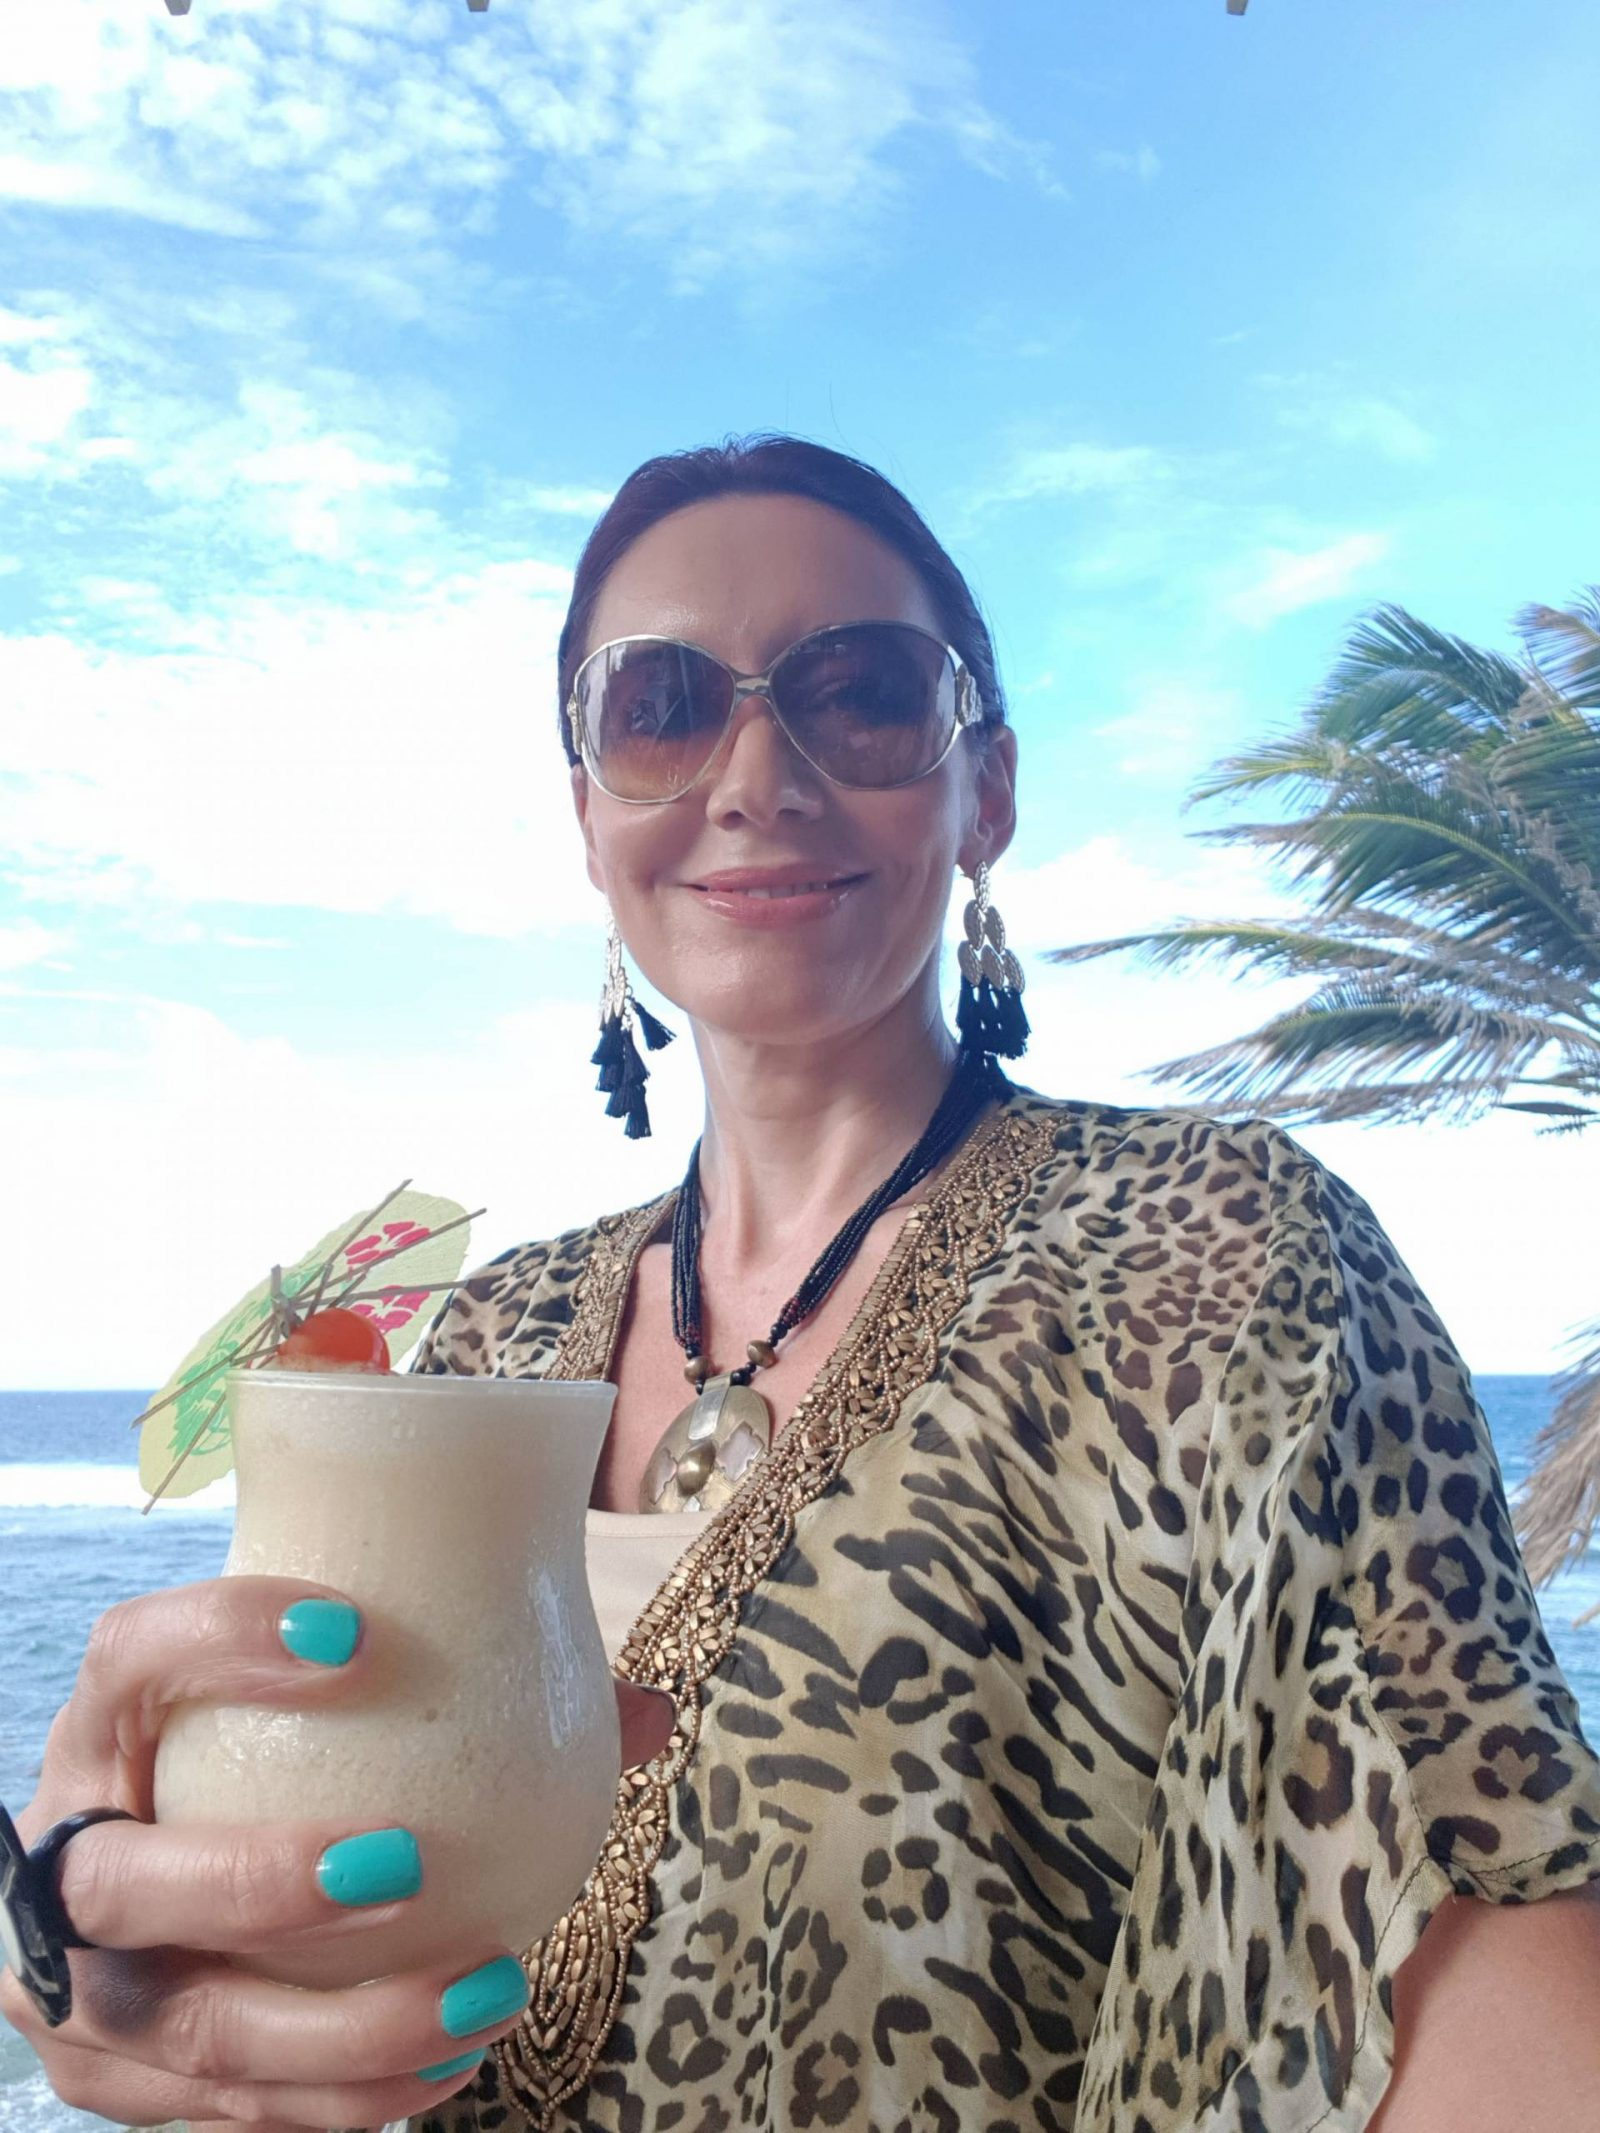 Miss Tunica leopard print kaftan and lunch at The Atlantis Historic Inn